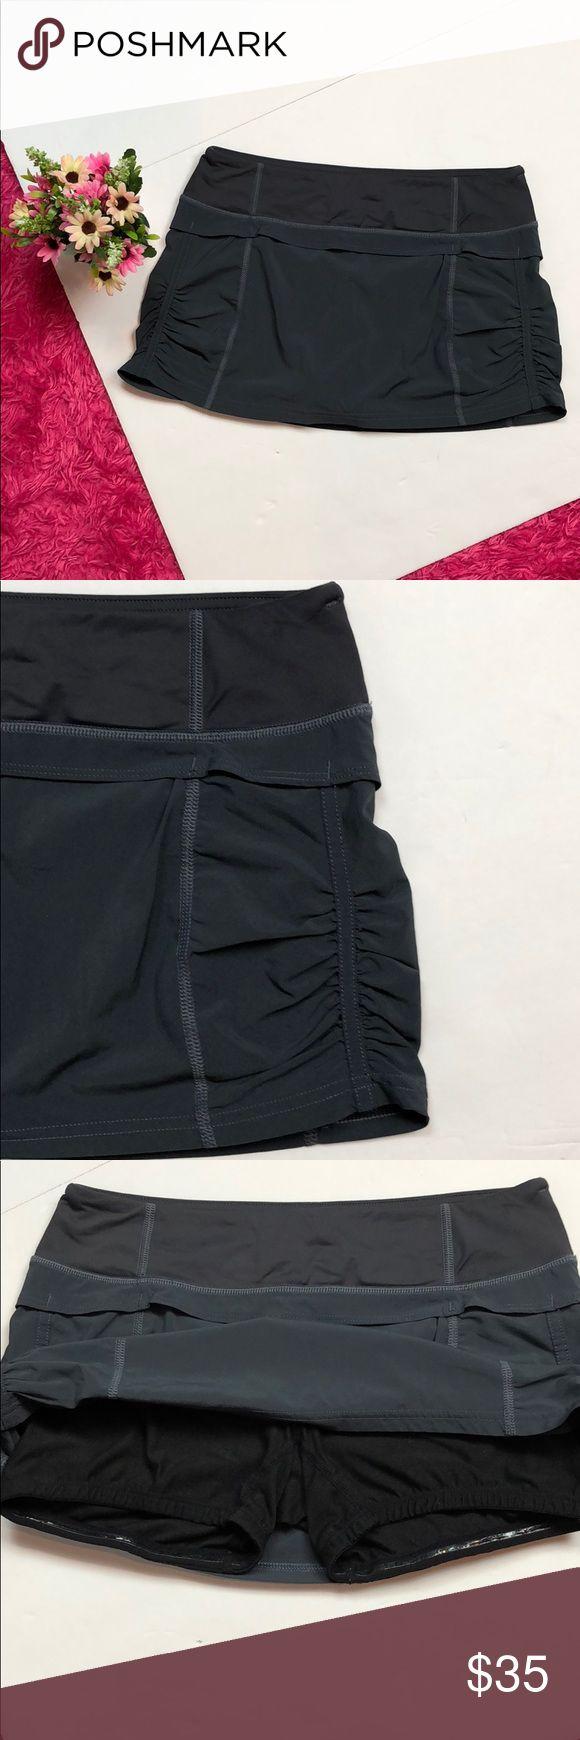 "Lululemon Gray Skort Lululemon Gray skirt with shorts underneath   Size 4   Polyester/ spandex /nylon /Lycra spandex   Drawstring waist   Waist 13.5"" Length 11"" lululemon athletica Shorts Skorts"